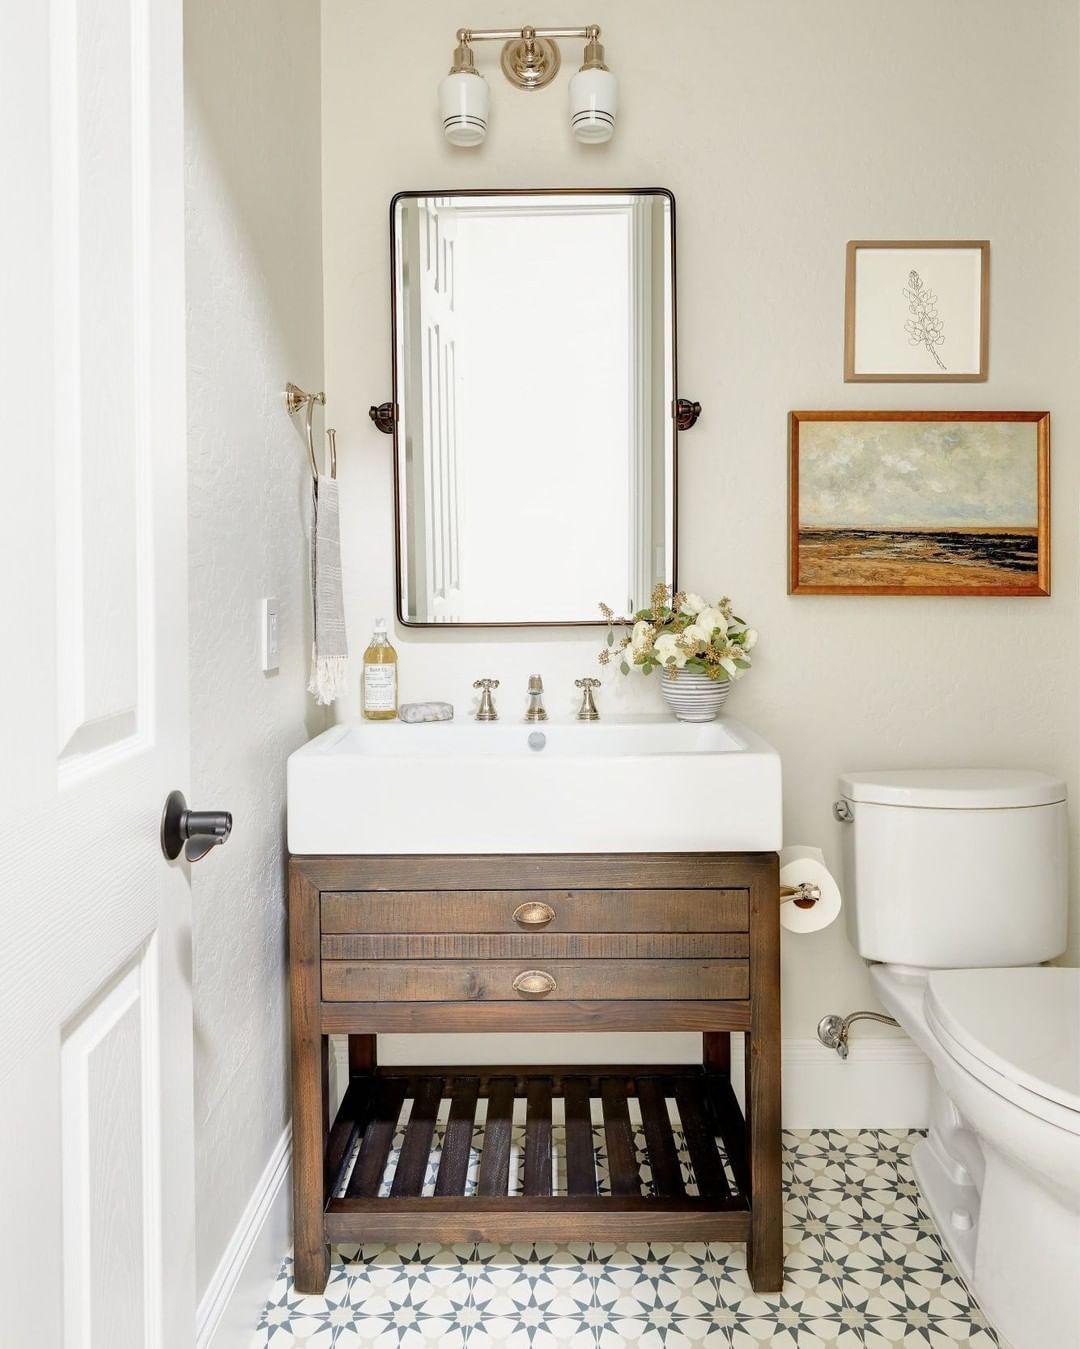 Lexi Westergard Design On Instagram This Small Guest Bath Was The Perfect Spot To Go Bold With Tile We K Wood Bathroom Vanity Powder Bath Dark Wood Bathroom [ 1349 x 1080 Pixel ]